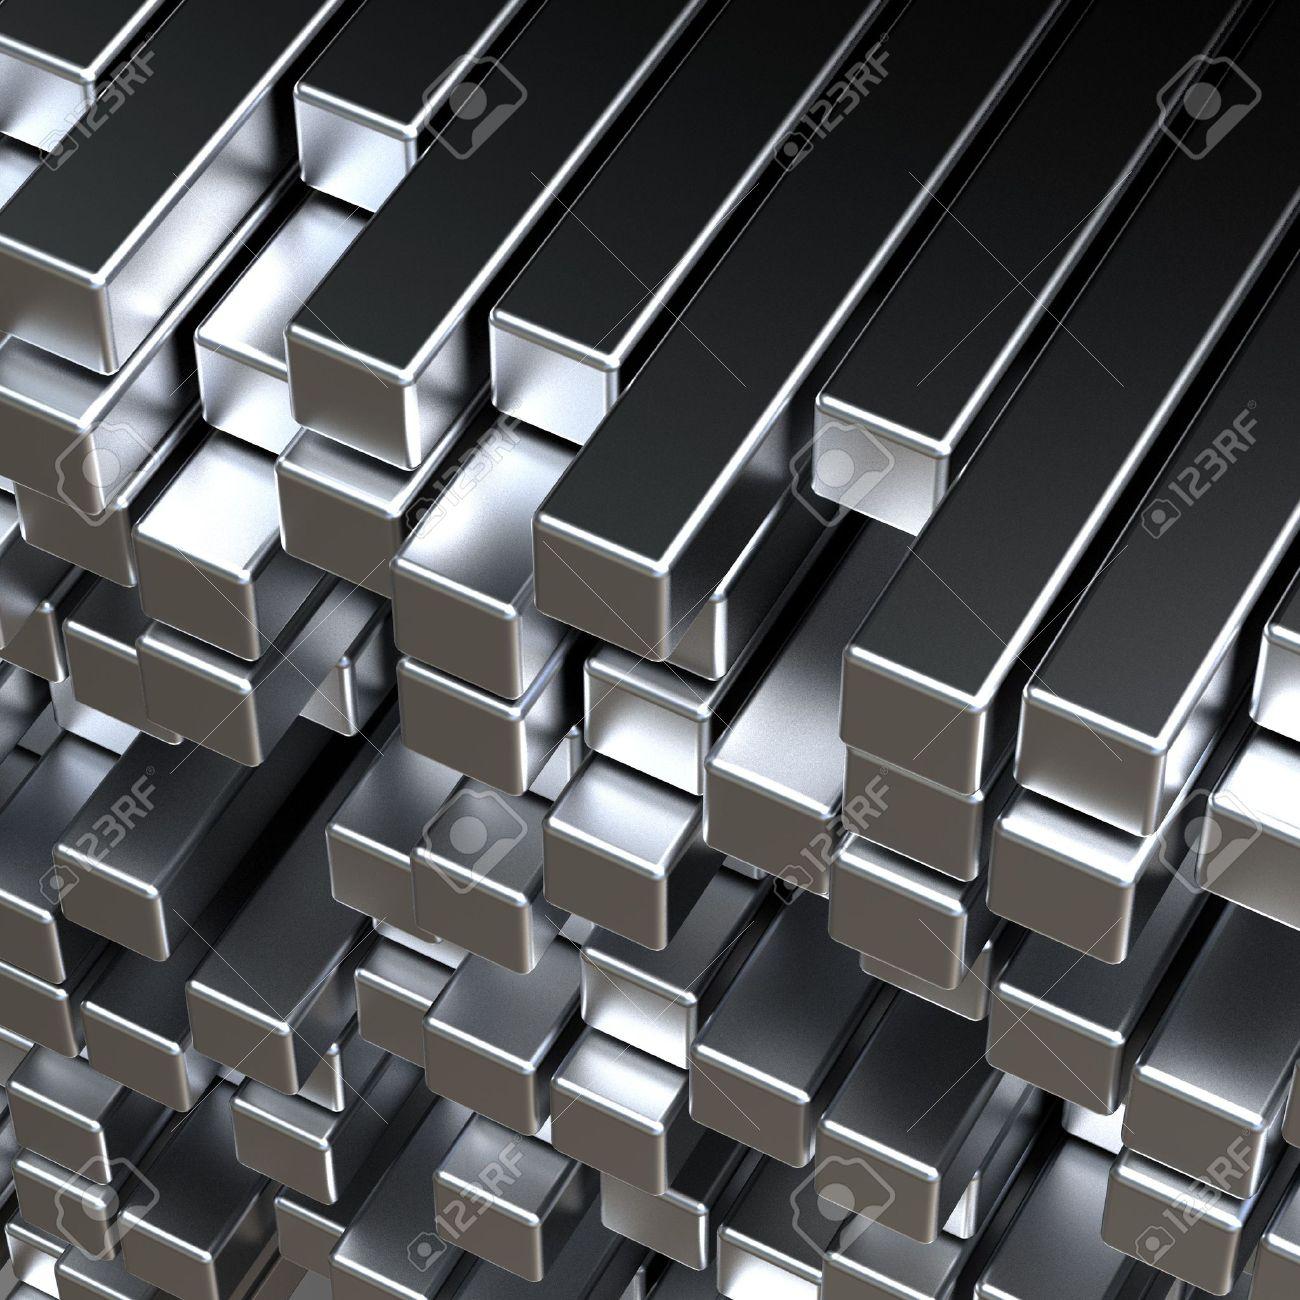 5825010-3d-abstract-silver-metal-bars.jpg